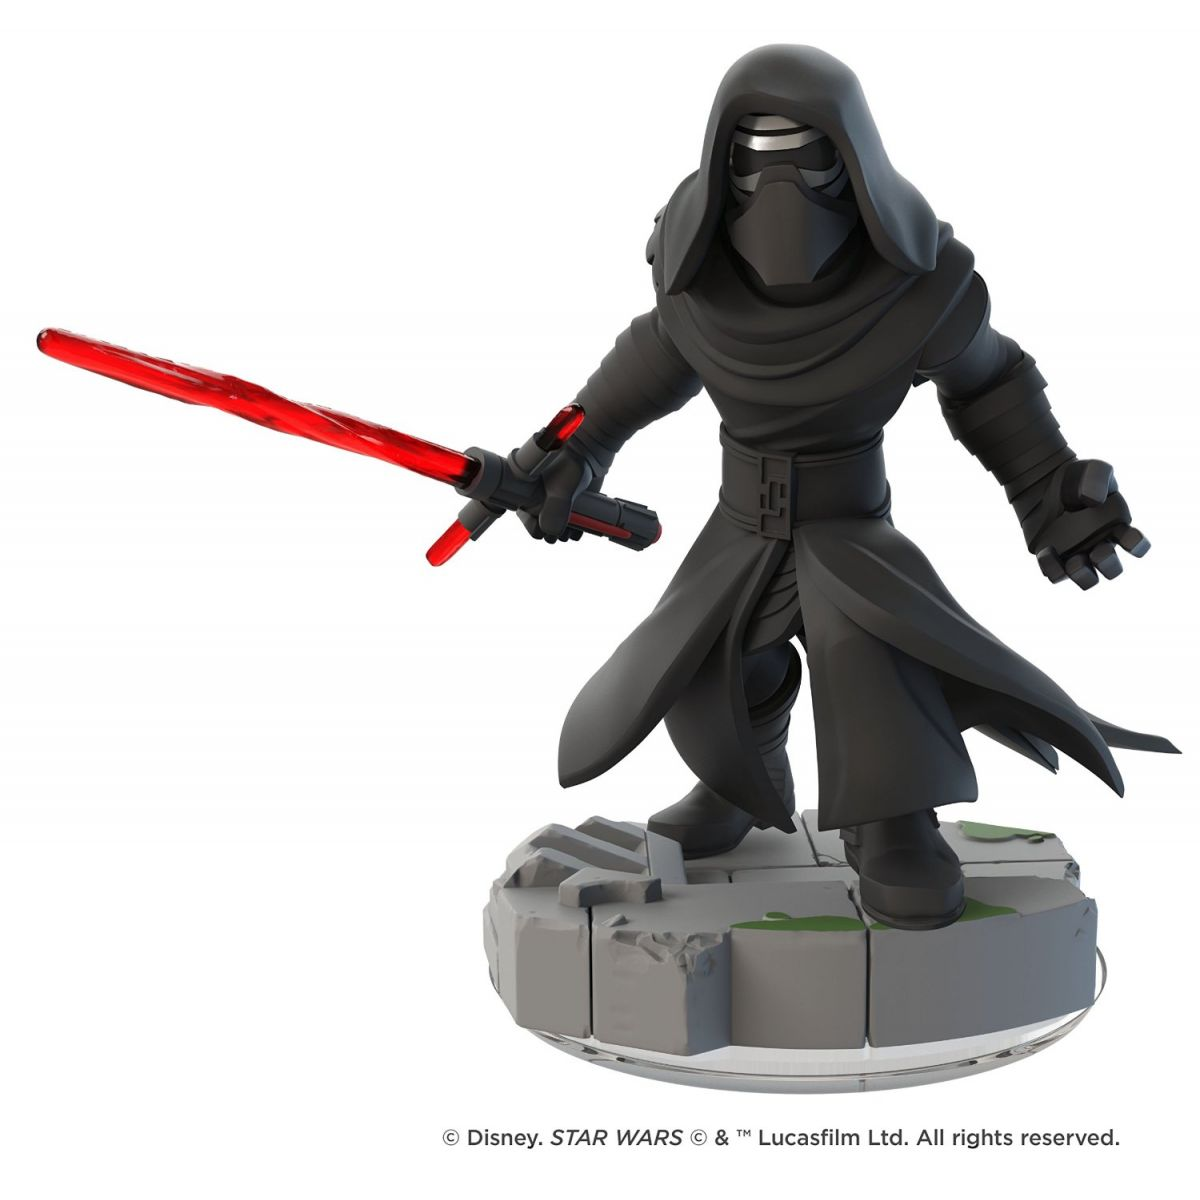 Disney Infinity 3.0 Edition: Star Wars Kylo Ren Figure  - Movie Freaks Collectibles